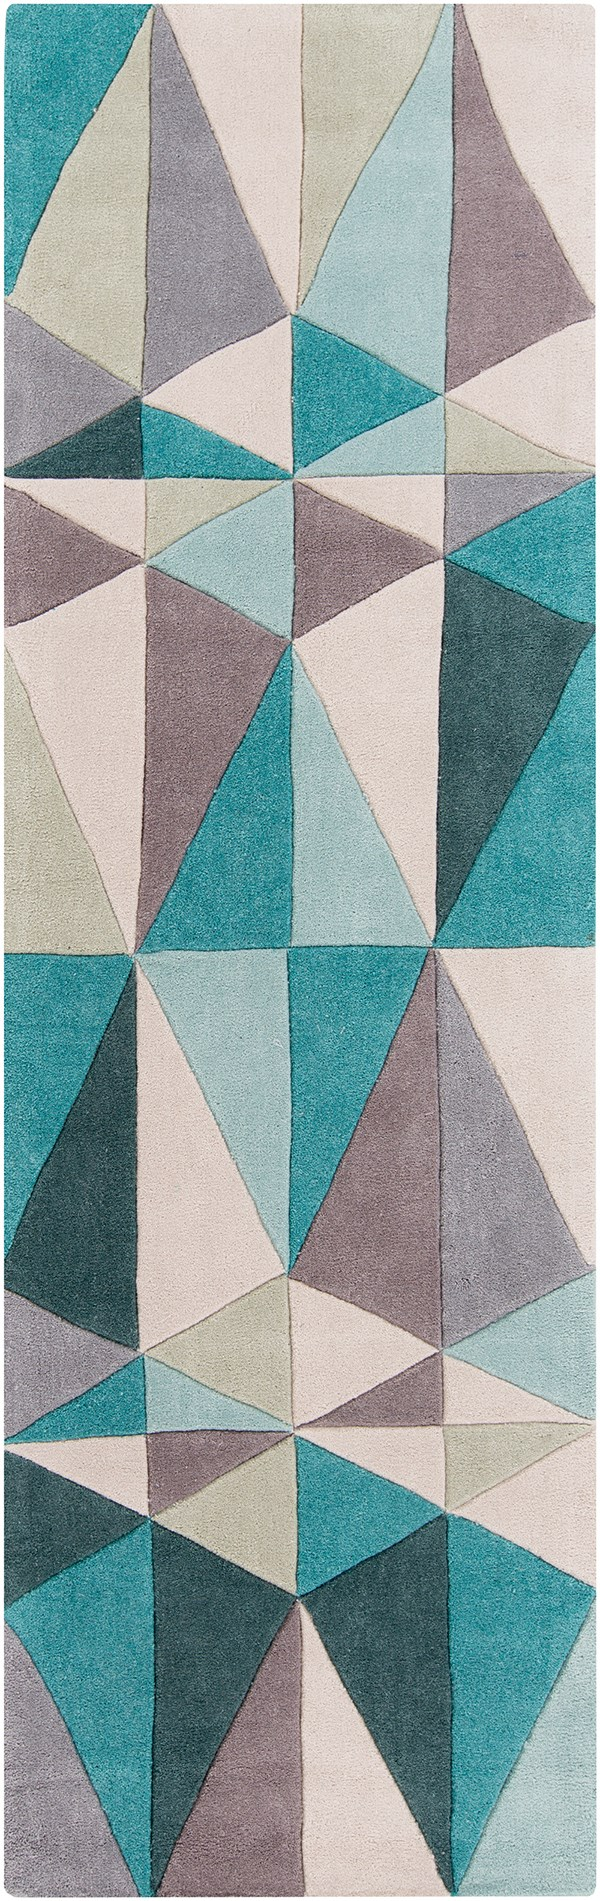 Teal Blue, Blue Haze, Parchment Contemporary / Modern Area Rug